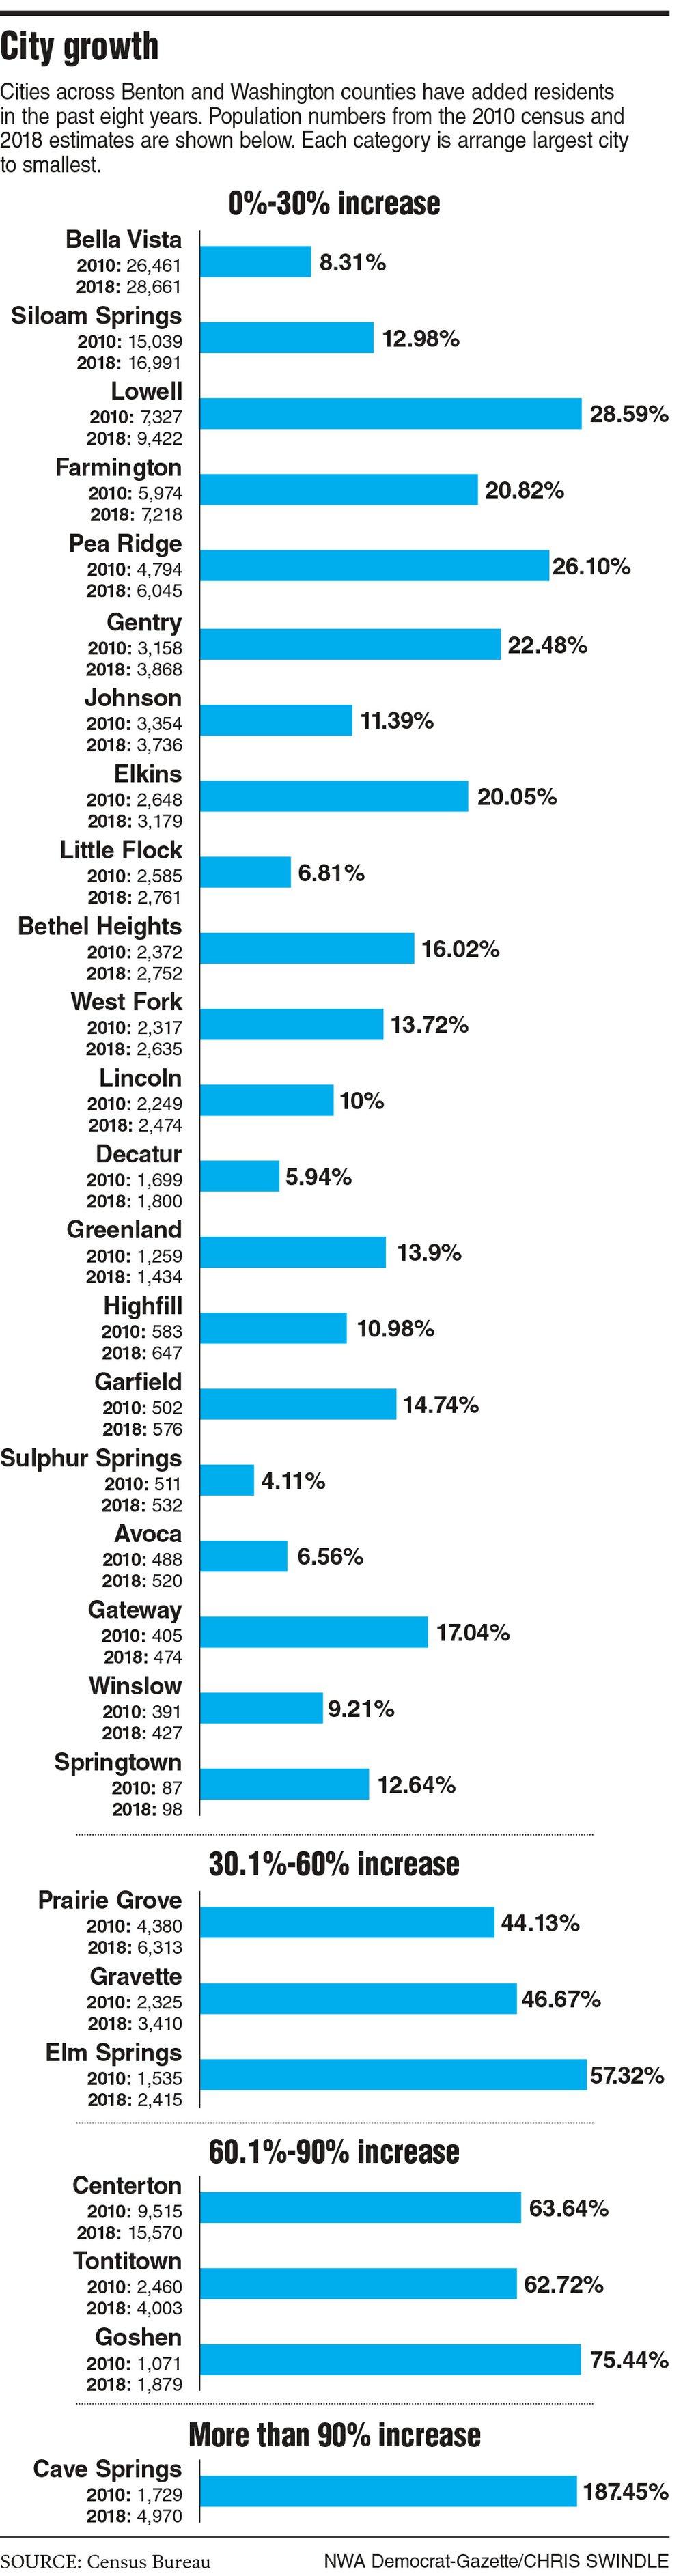 City growth in Benton and Washington counties